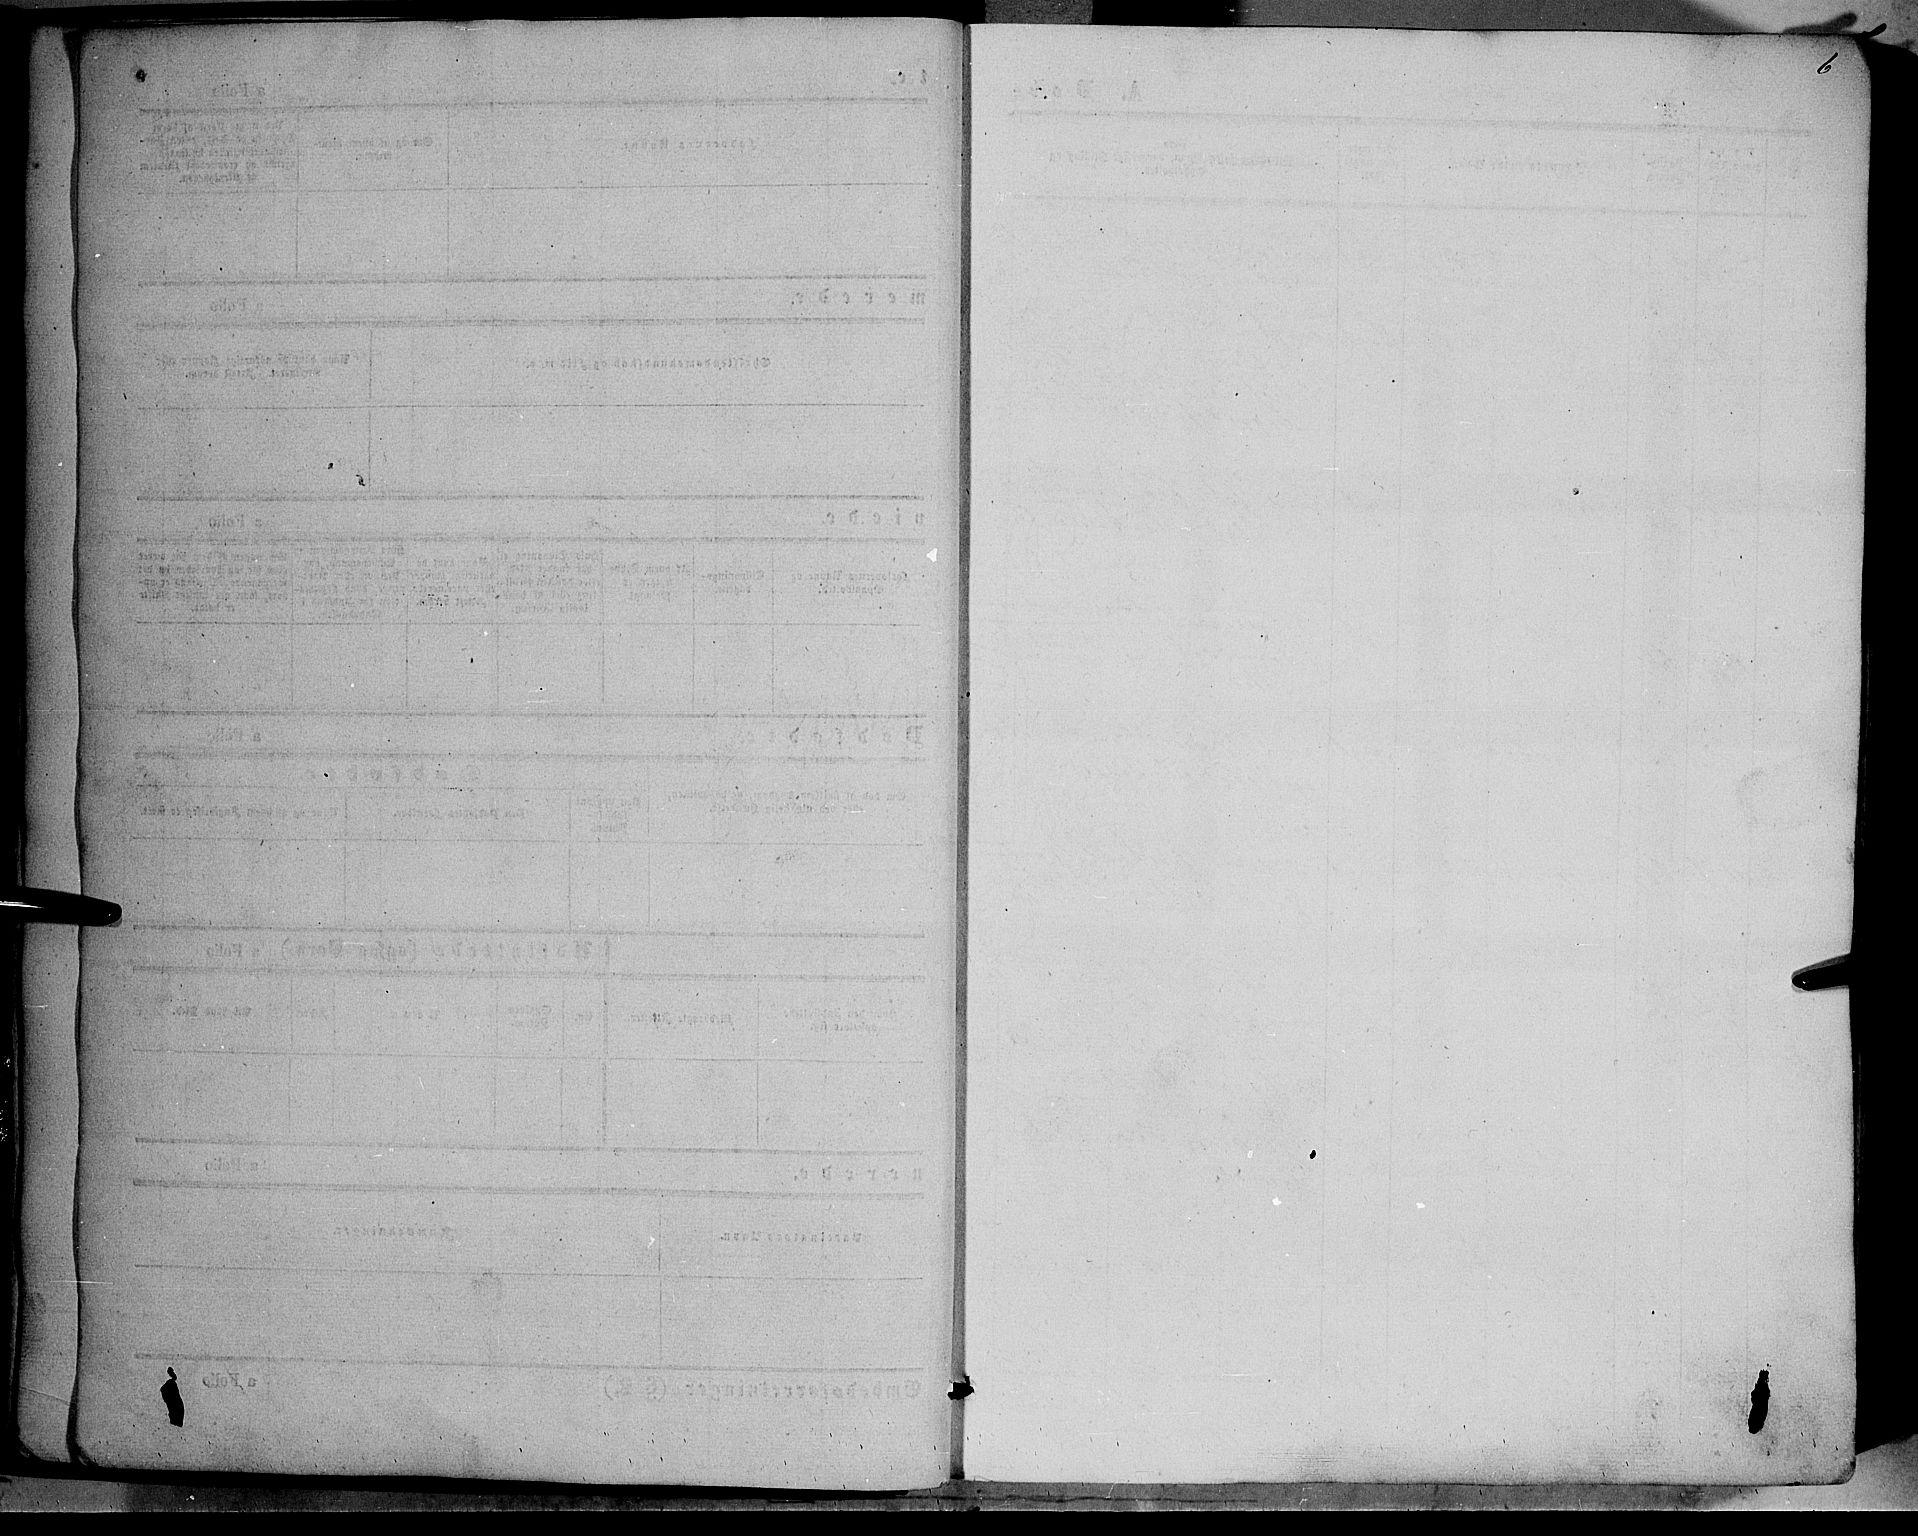 SAH, Vestre Slidre prestekontor, Ministerialbok nr. 2, 1856-1864, s. 6